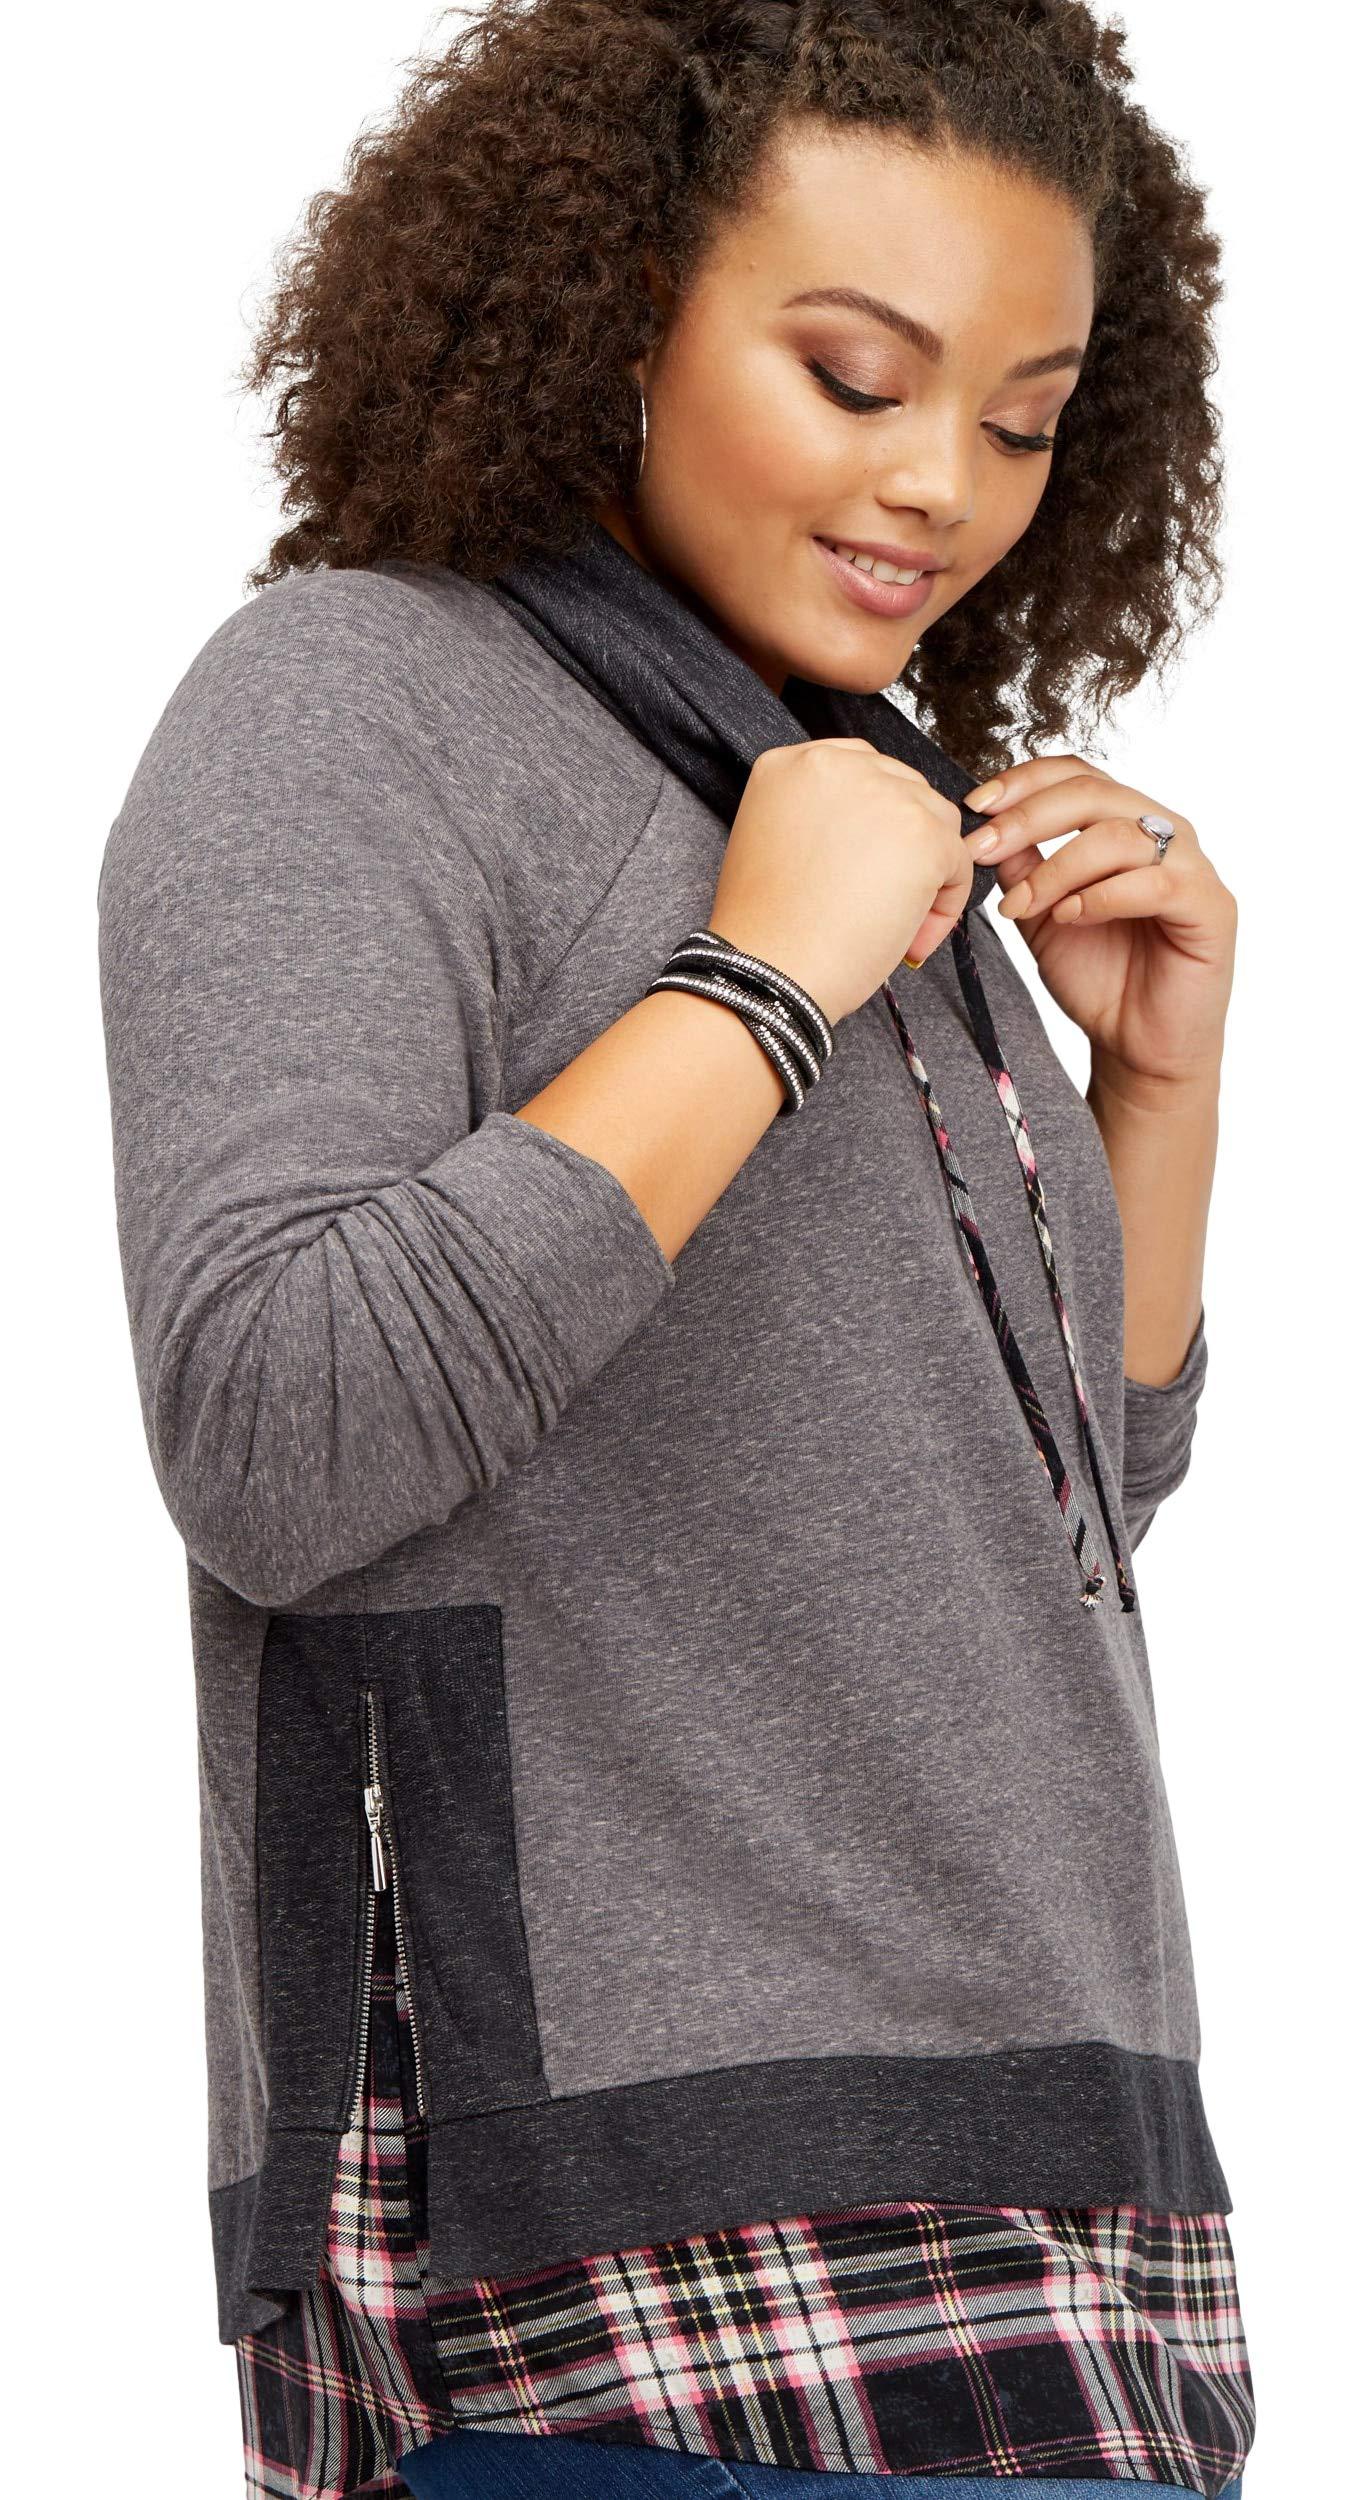 maurices Women's Plus Size Plaid Cowl Neck Sweatshirt 3 Gray